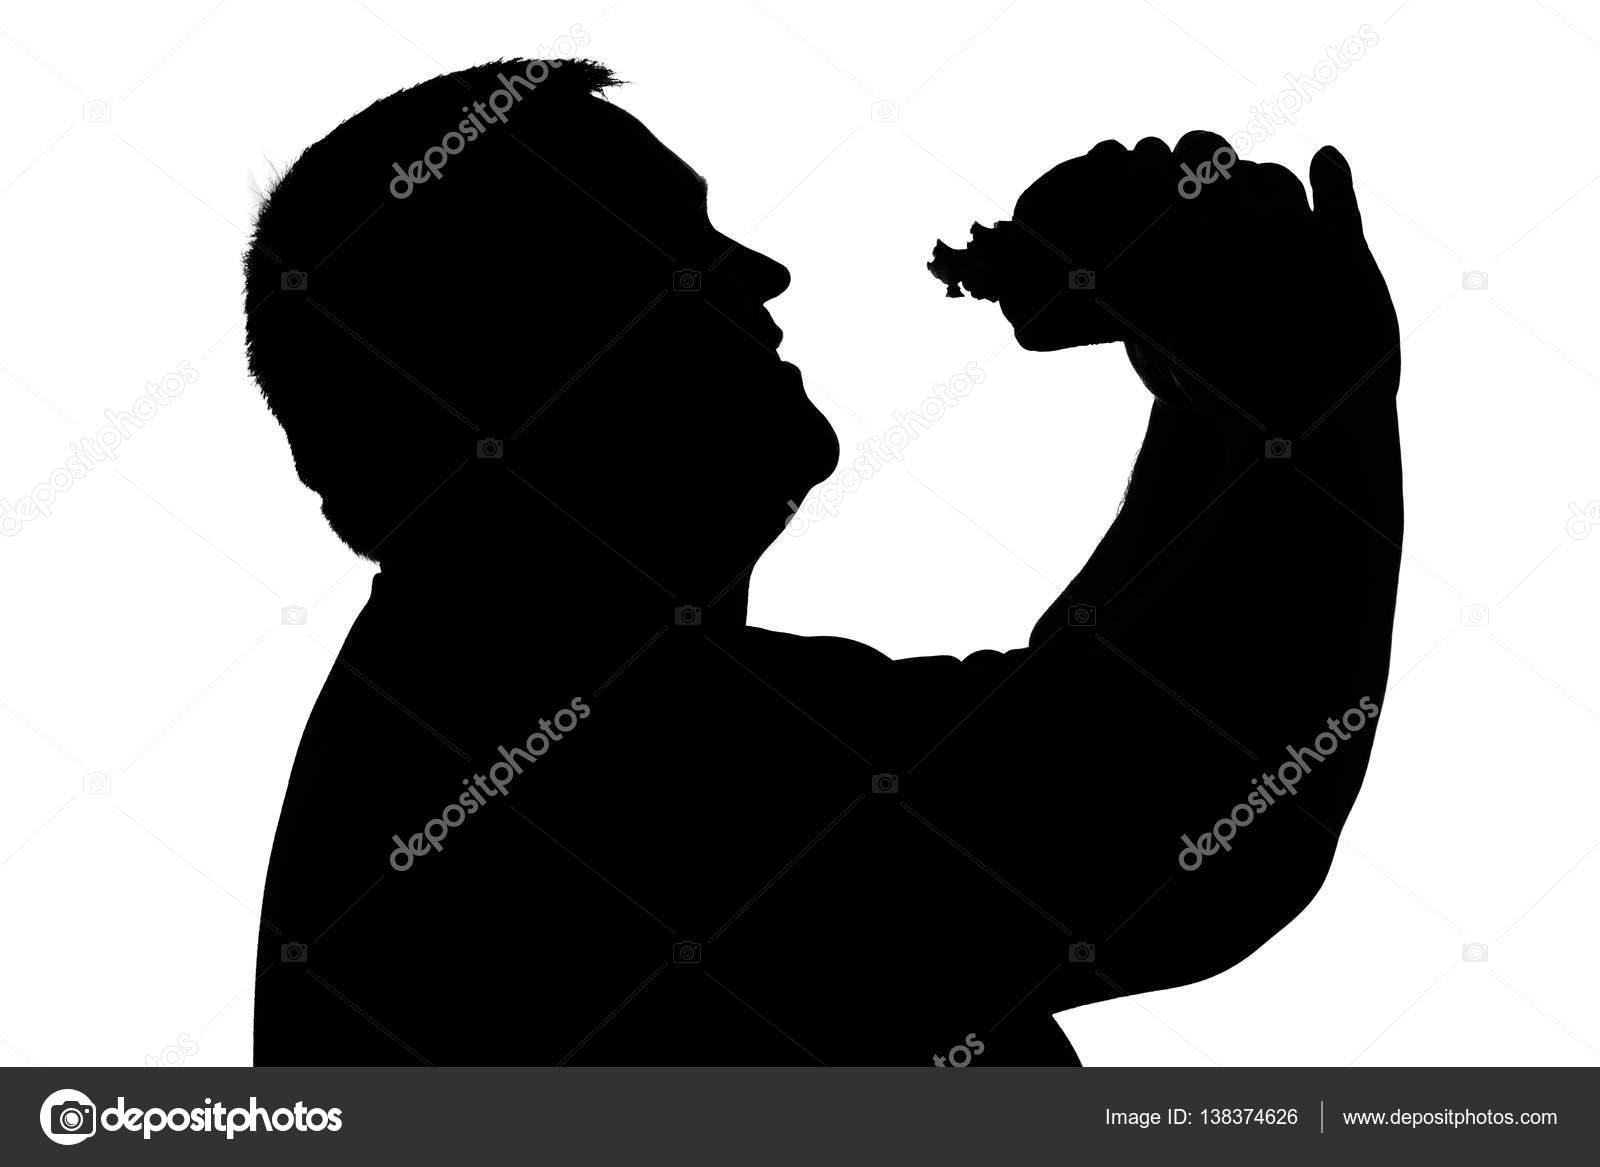 Silueta De Un Hombre Con Sobrepeso Comiendo Hamburguesa